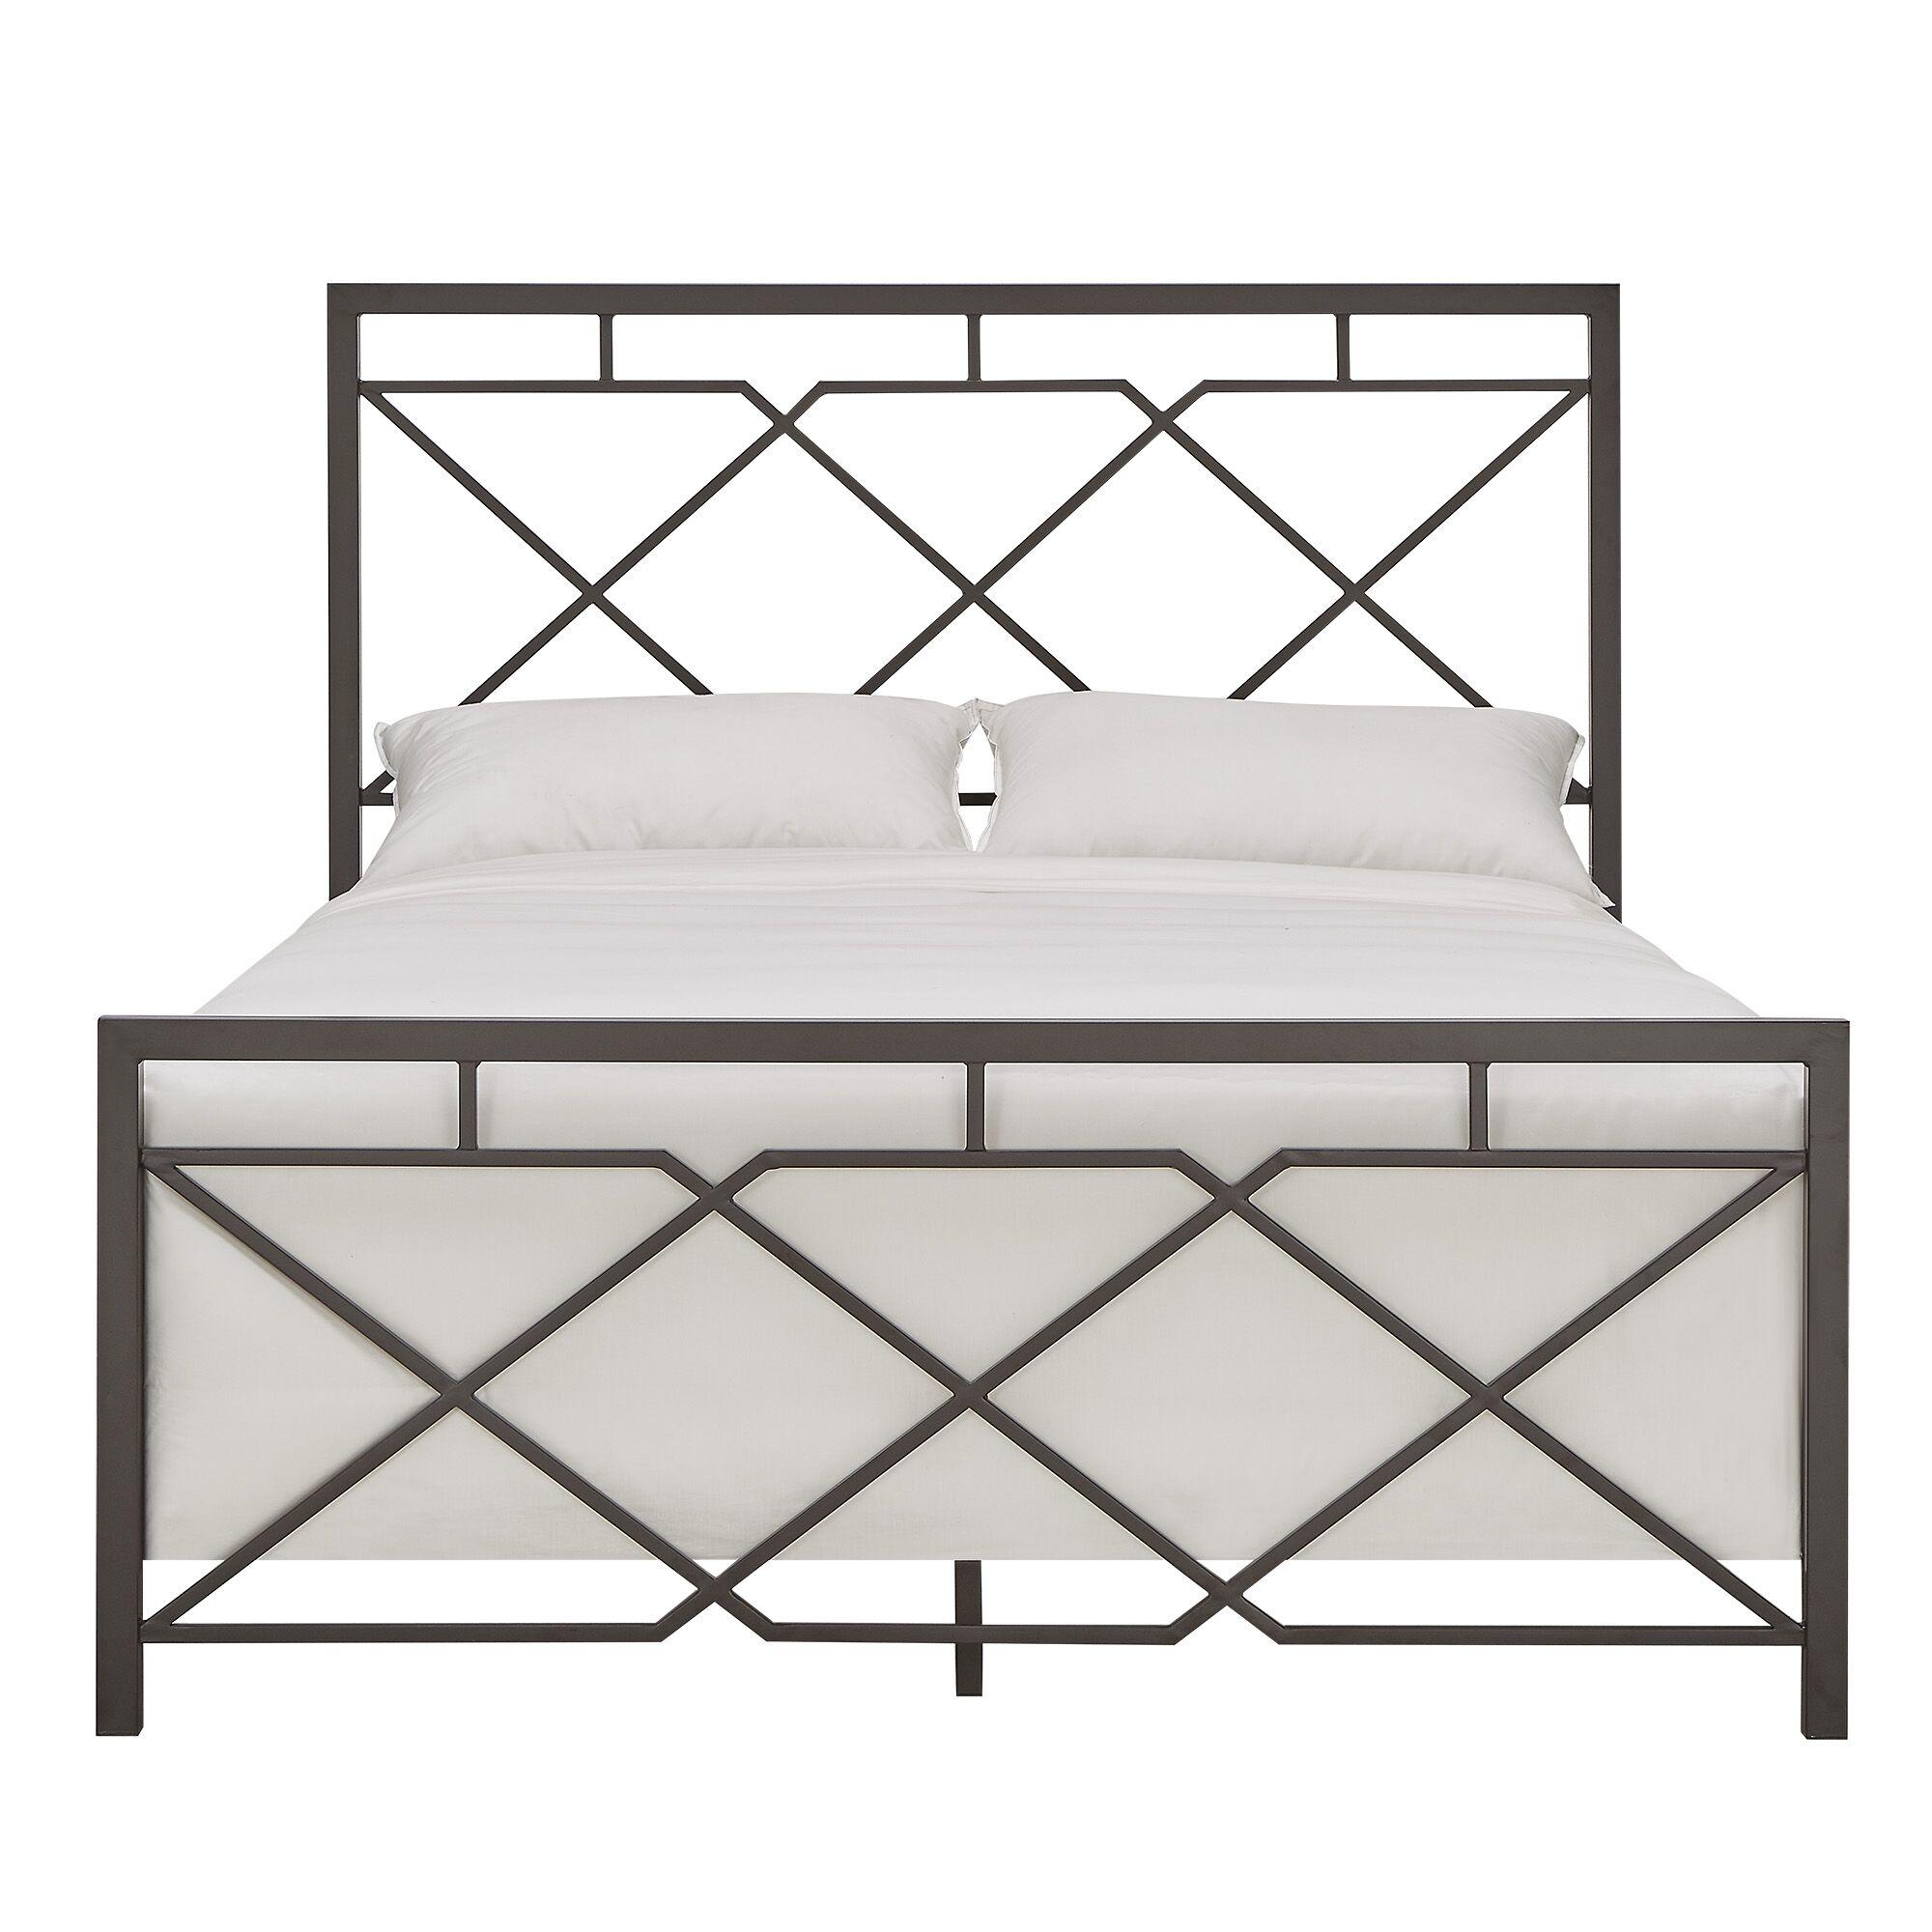 Ingersoll Metal Panel Bed Size: King